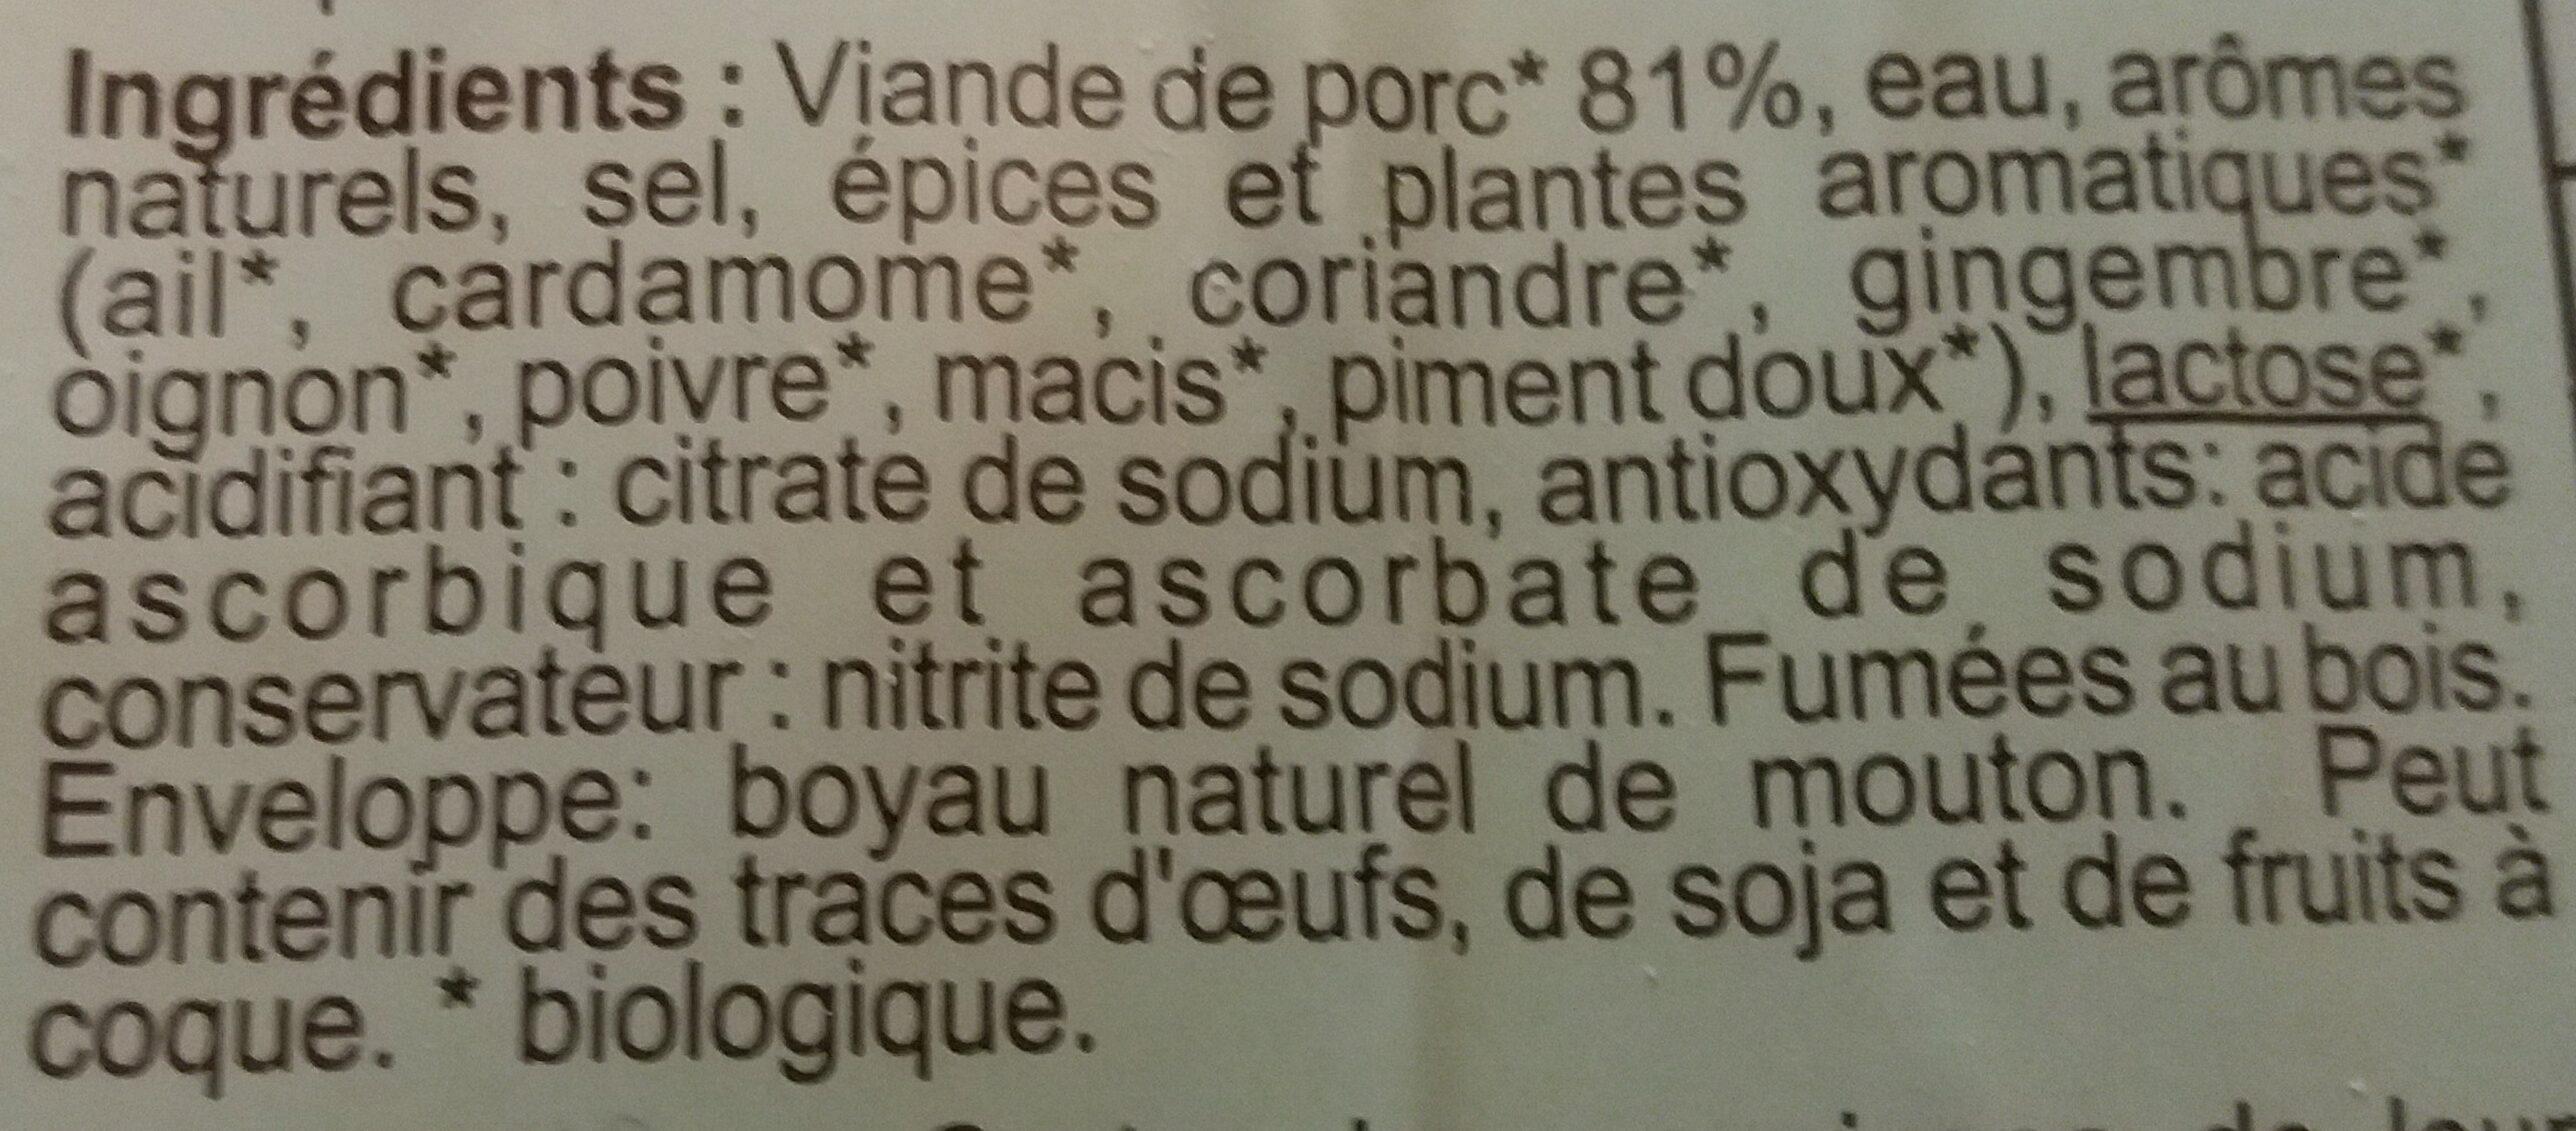 Knack bio qualité supérieure - Ingredients